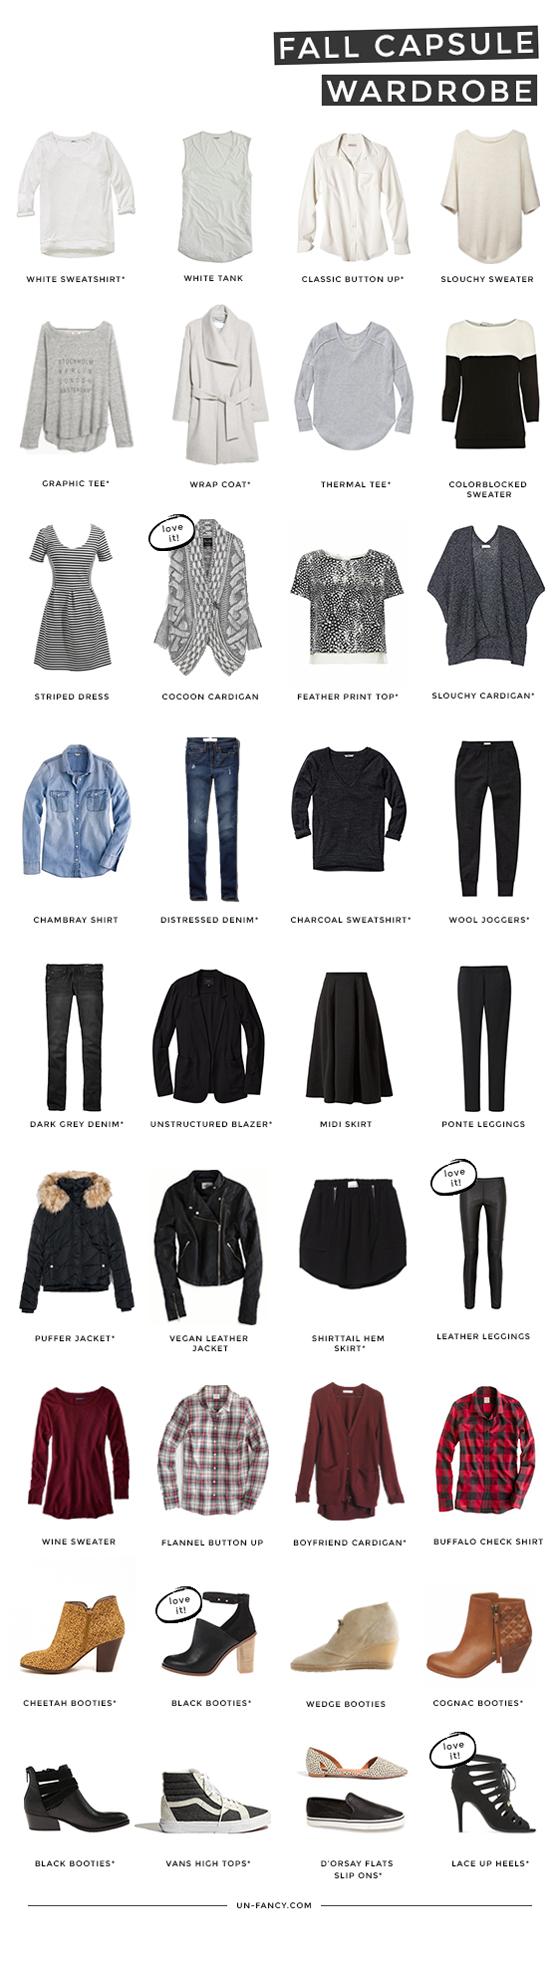 fall-capsule-wardrobe2